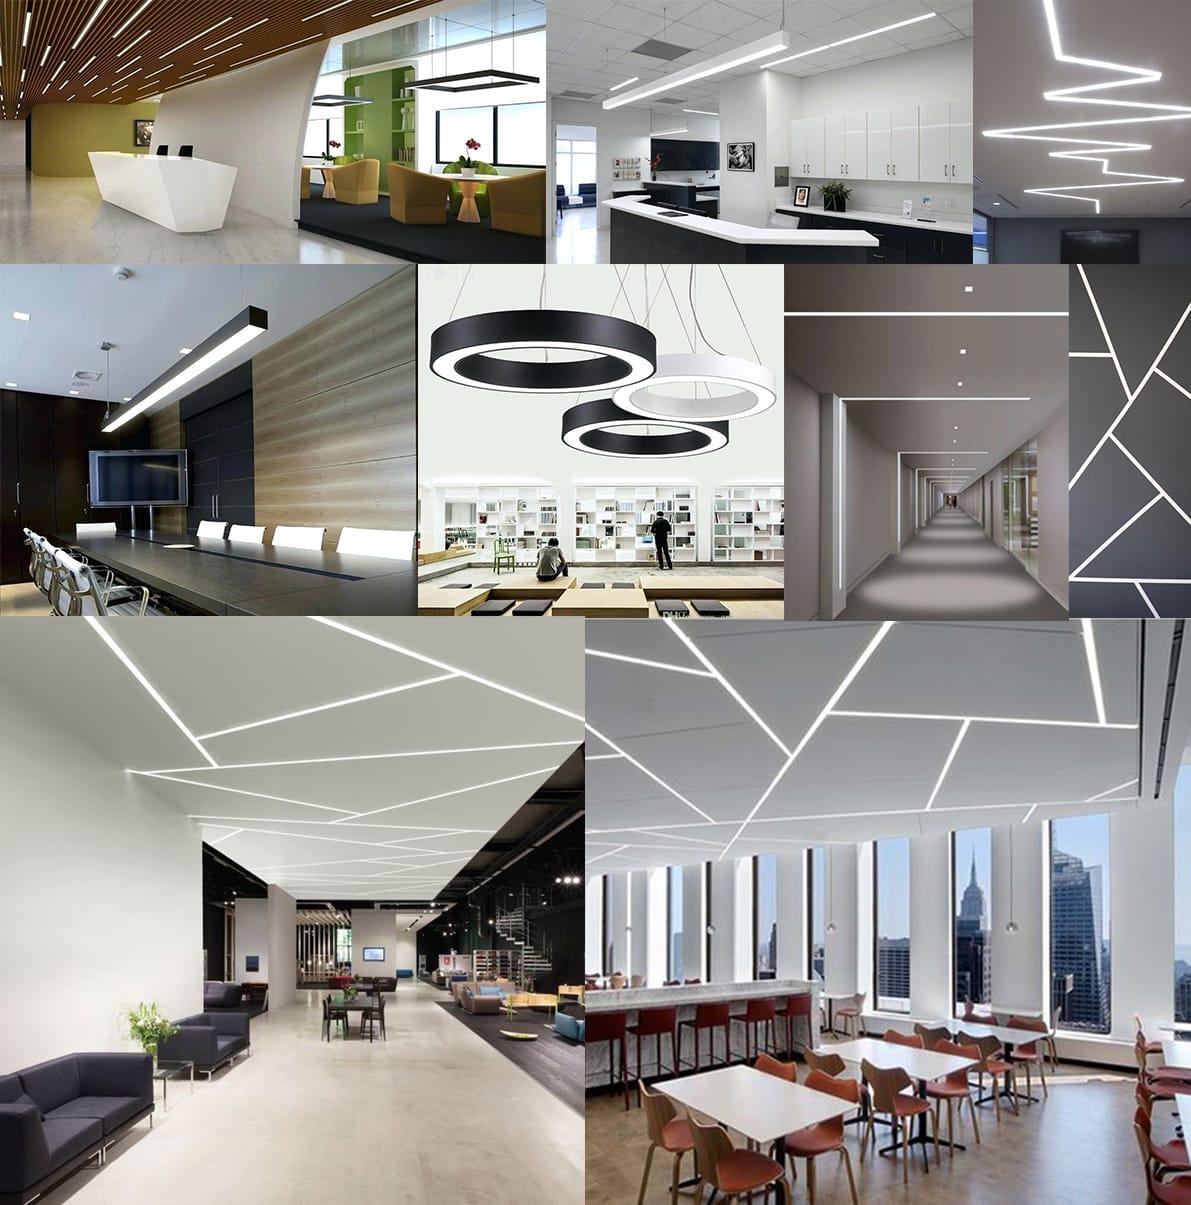 RHEA LED Linear Office Lights